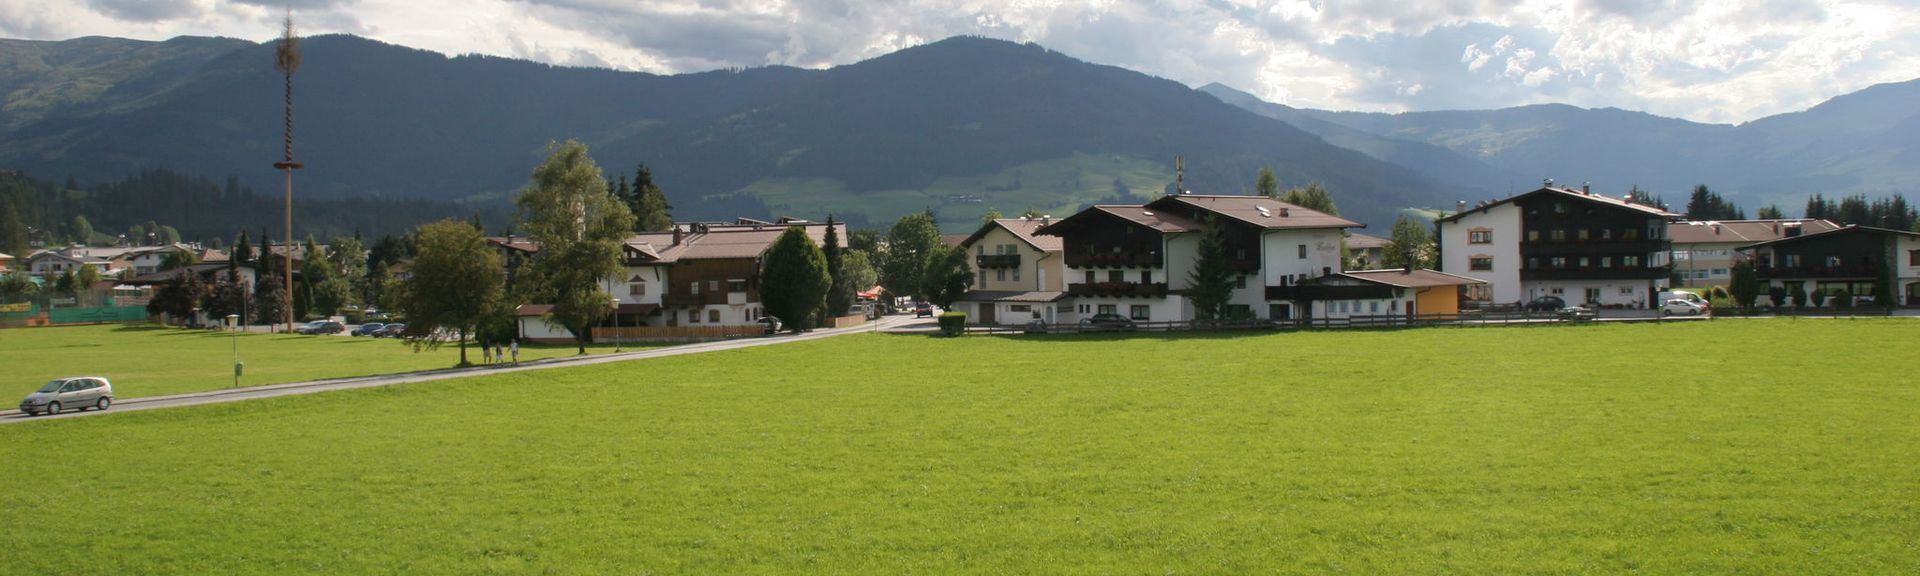 Brixental, Tiroli, Itävalta